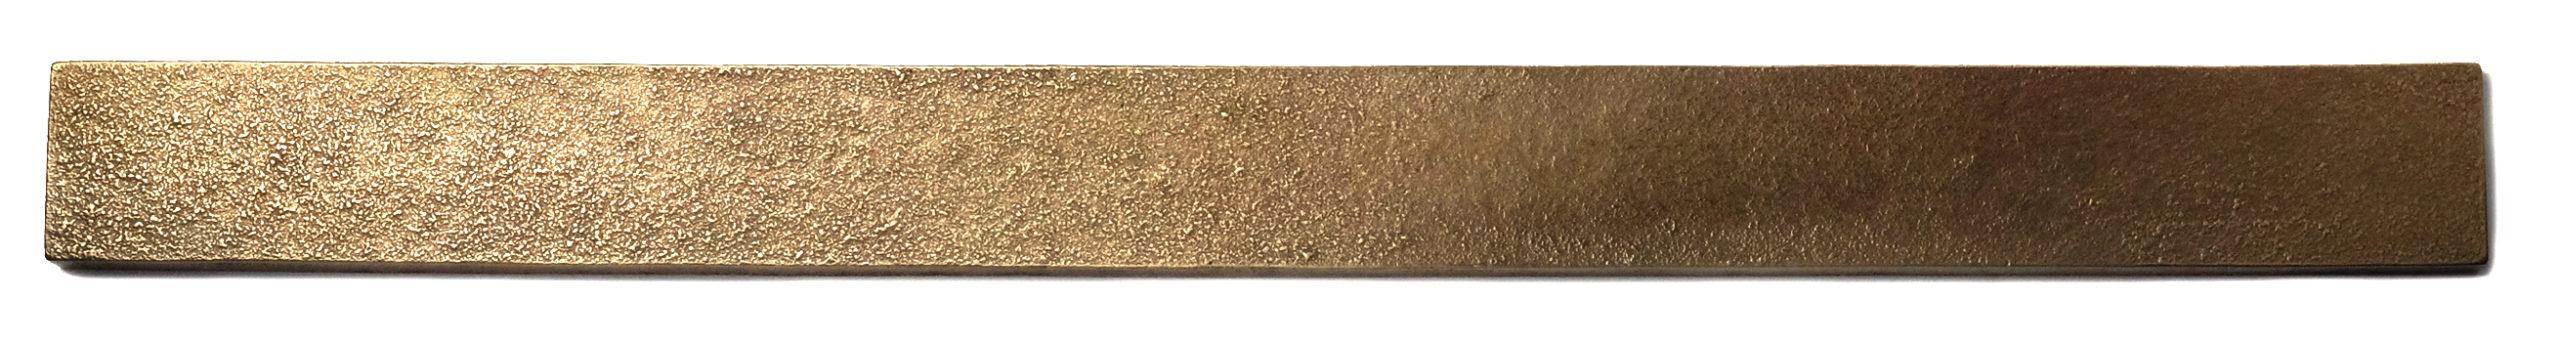 Origin Liner 1x12 inch accent liner Traditional Bronze